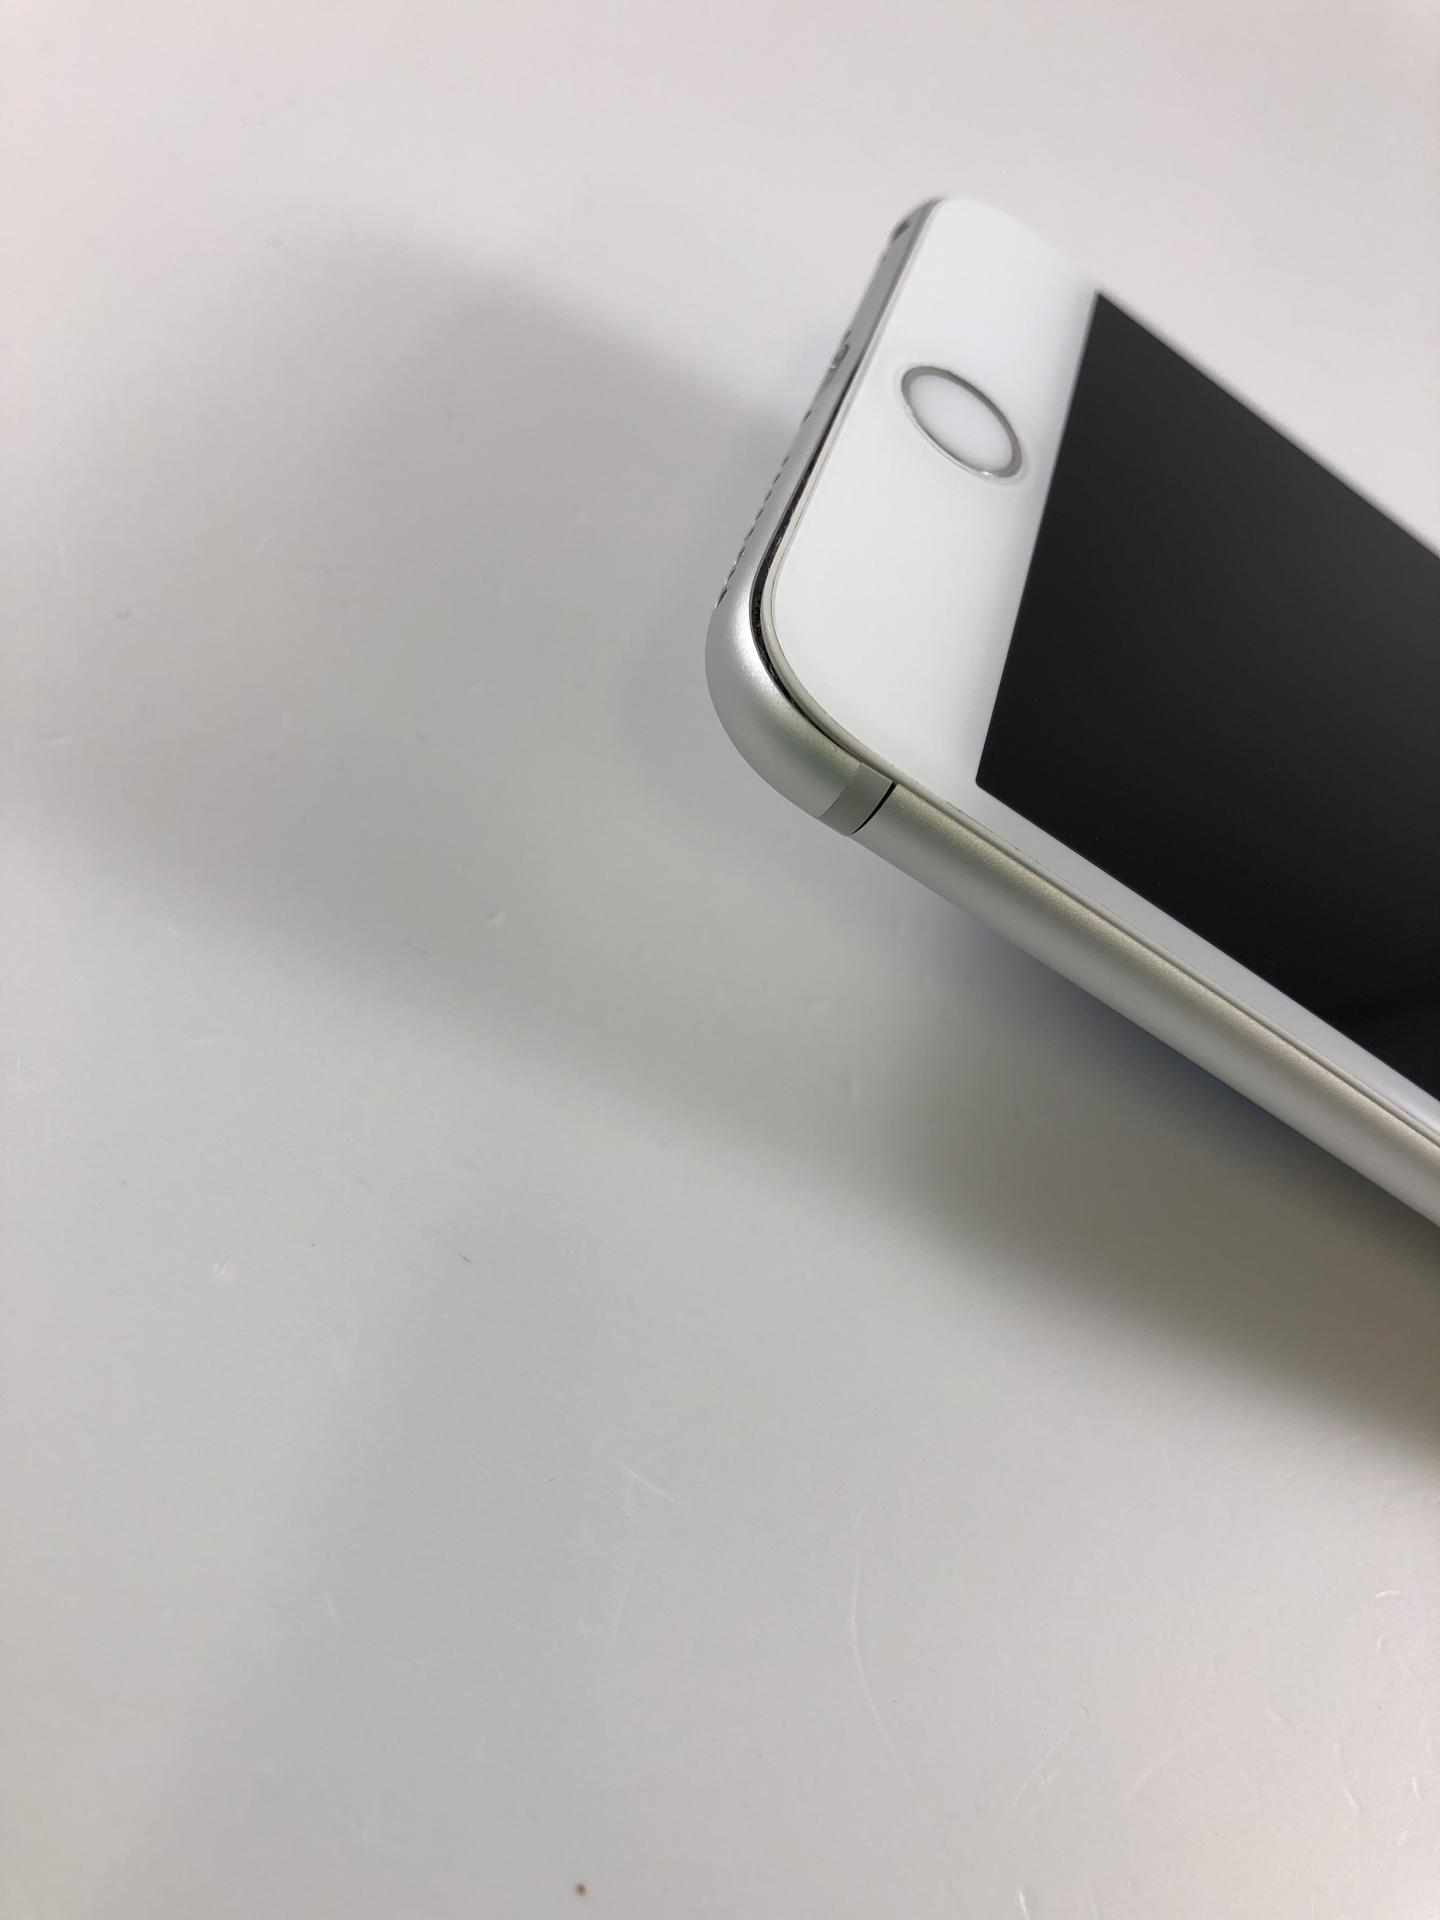 iPhone 6S Plus 32GB, 32GB, Silver, Kuva 3